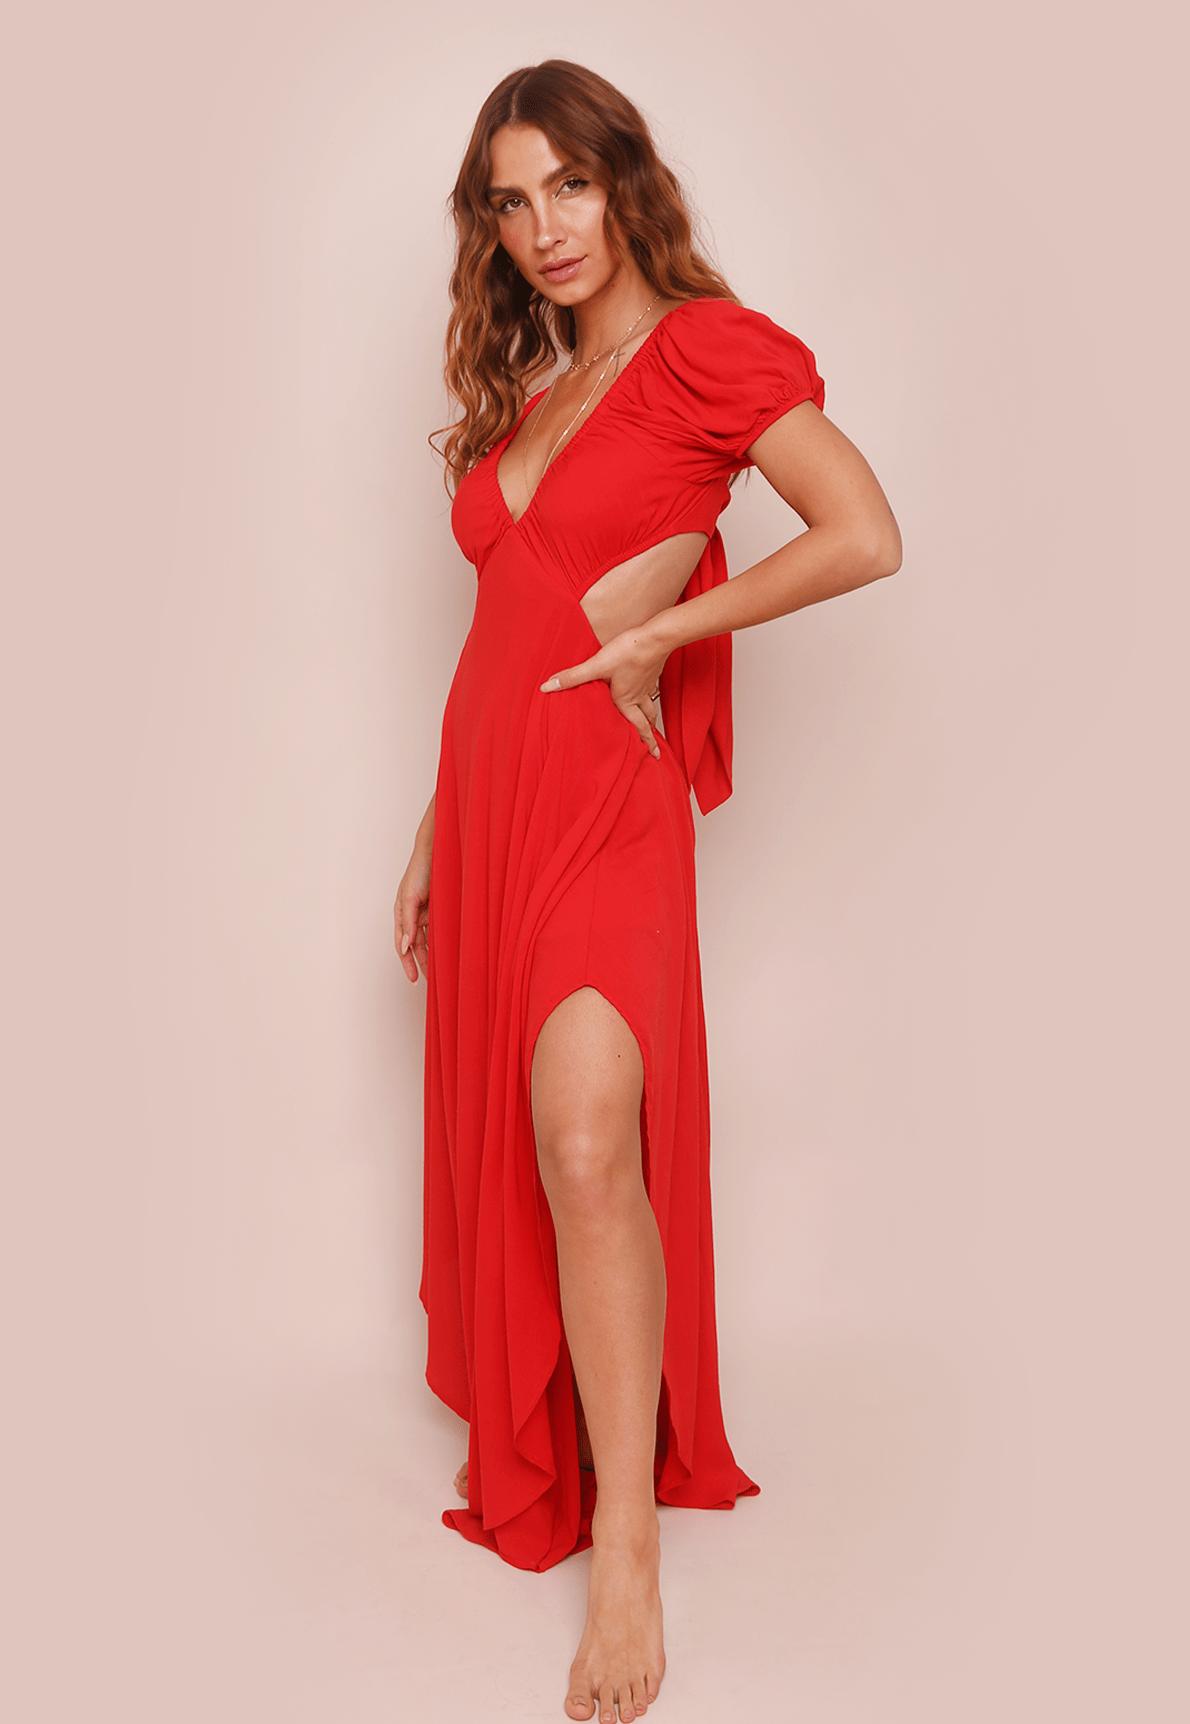 33638-vestido-lana-vermelho-mundo-lolita-03